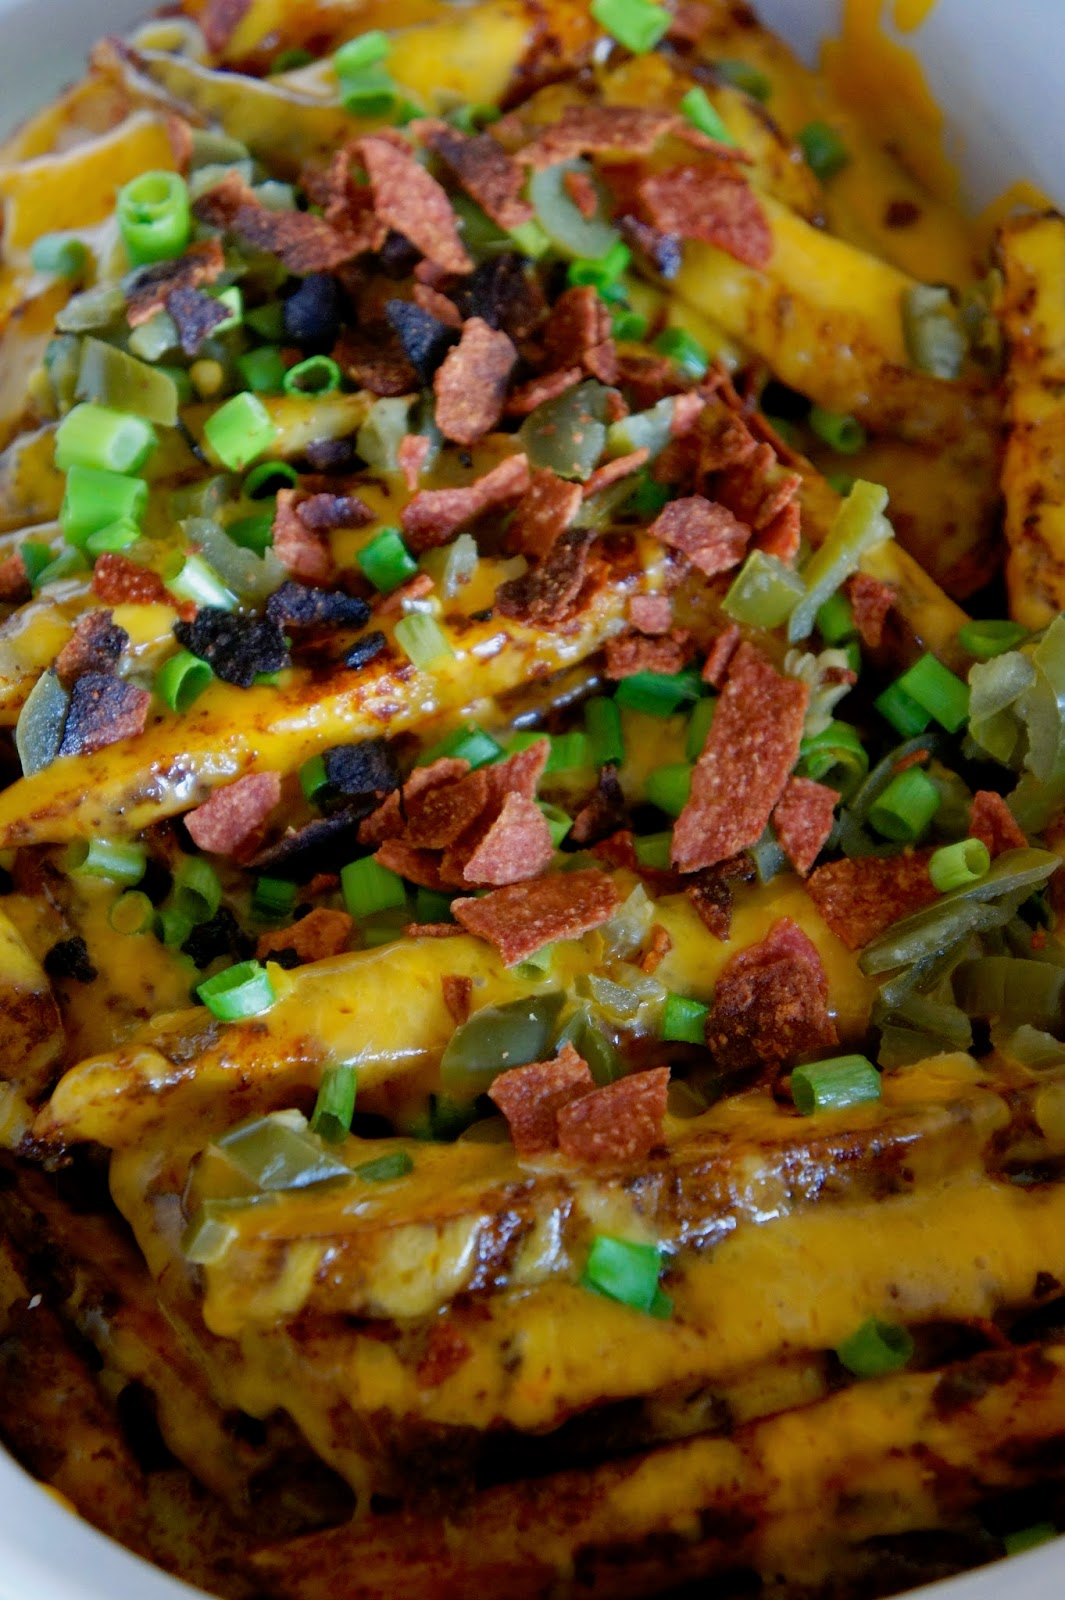 Skinny Texas Cheese Fries: Savory Sweet and Satisfying